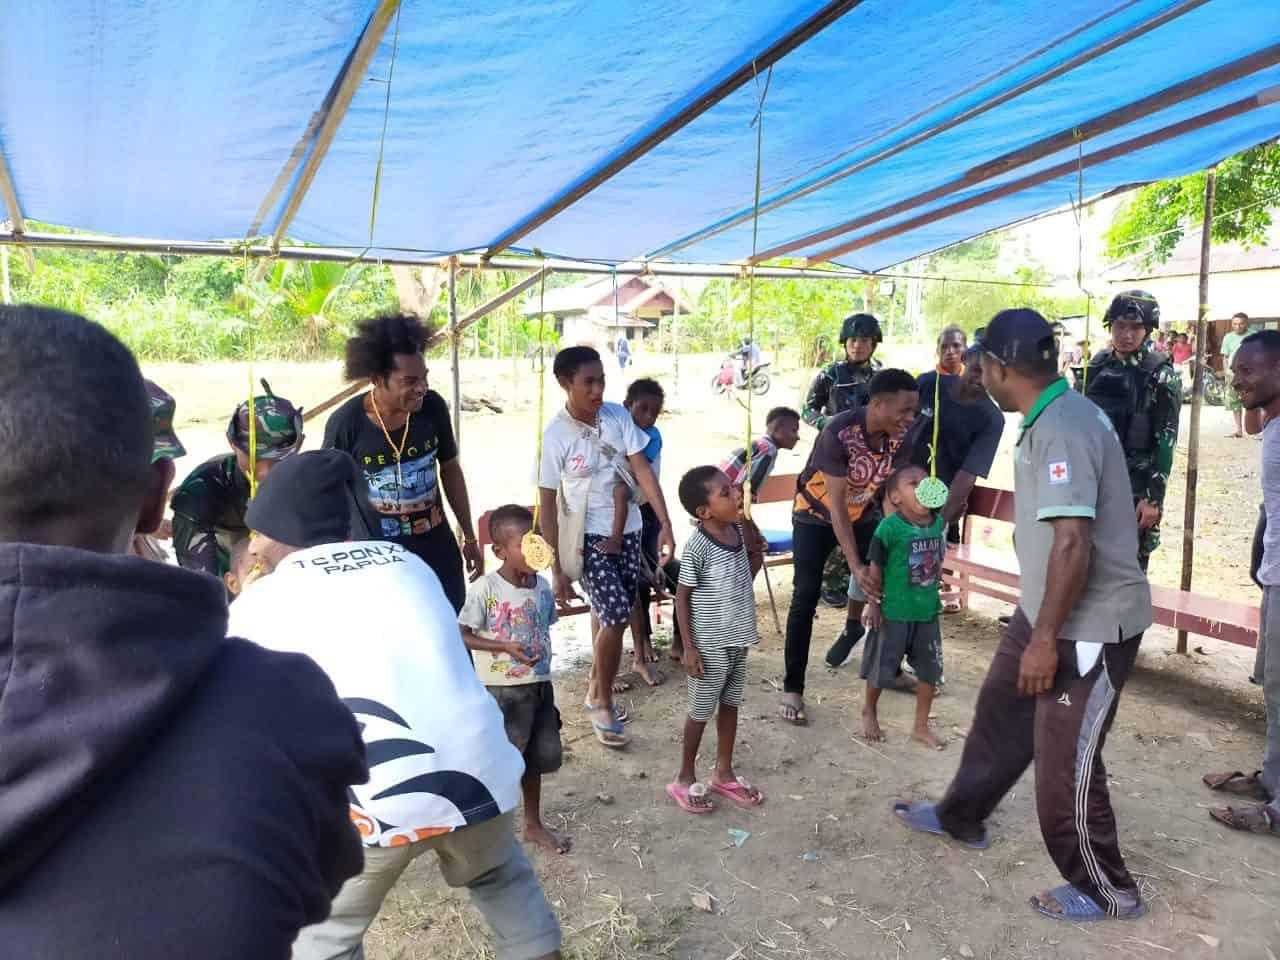 Perkuat Ikatan Persaudaraan, Satgas Yonif 403 Meriahkan Acara OMK Kampung Bompay